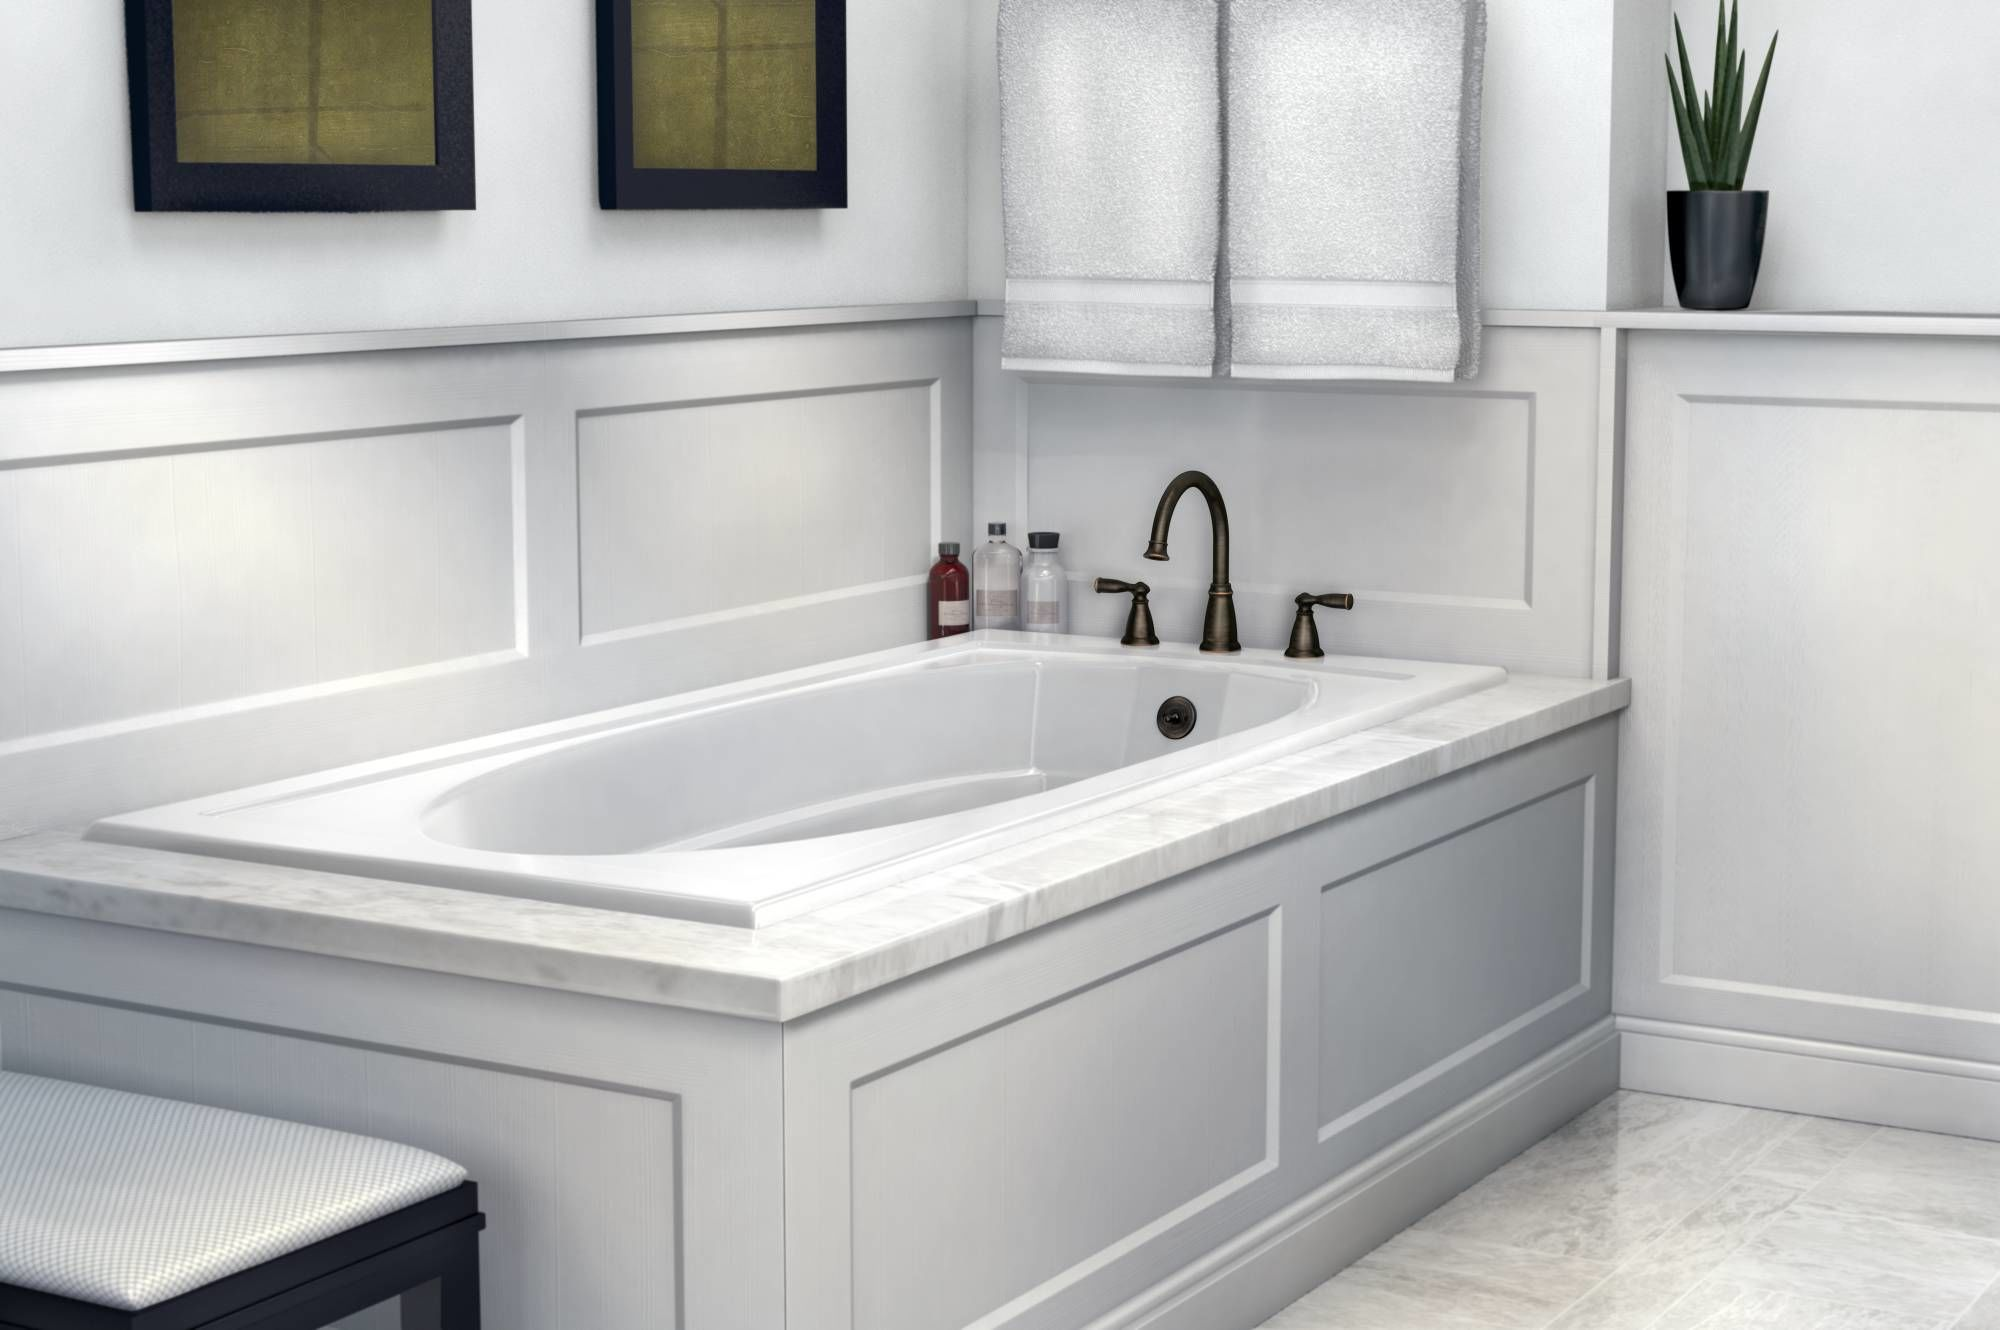 Kitchen Faucet Installation Instructions Kohler Kitchen Faucet Installation Instructions Kitchen Ideas